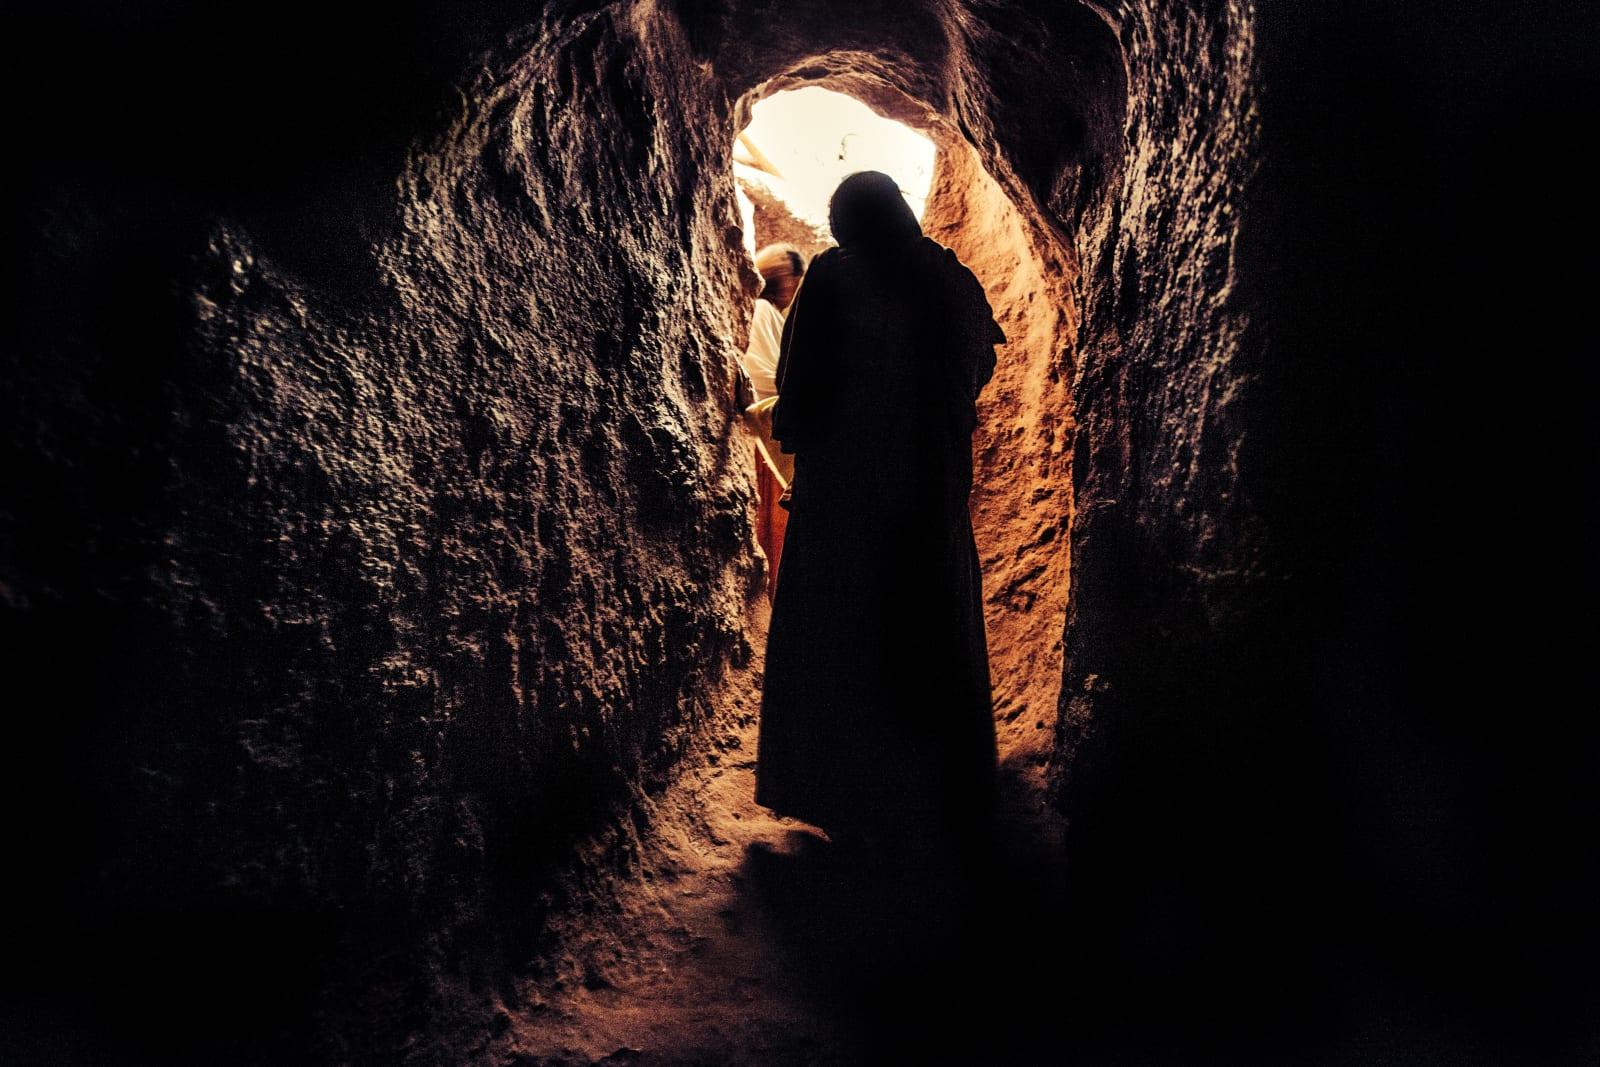 Abiy Solomon , Primordial Modernity: The Raw Spirit of Lalibela IV, 2014